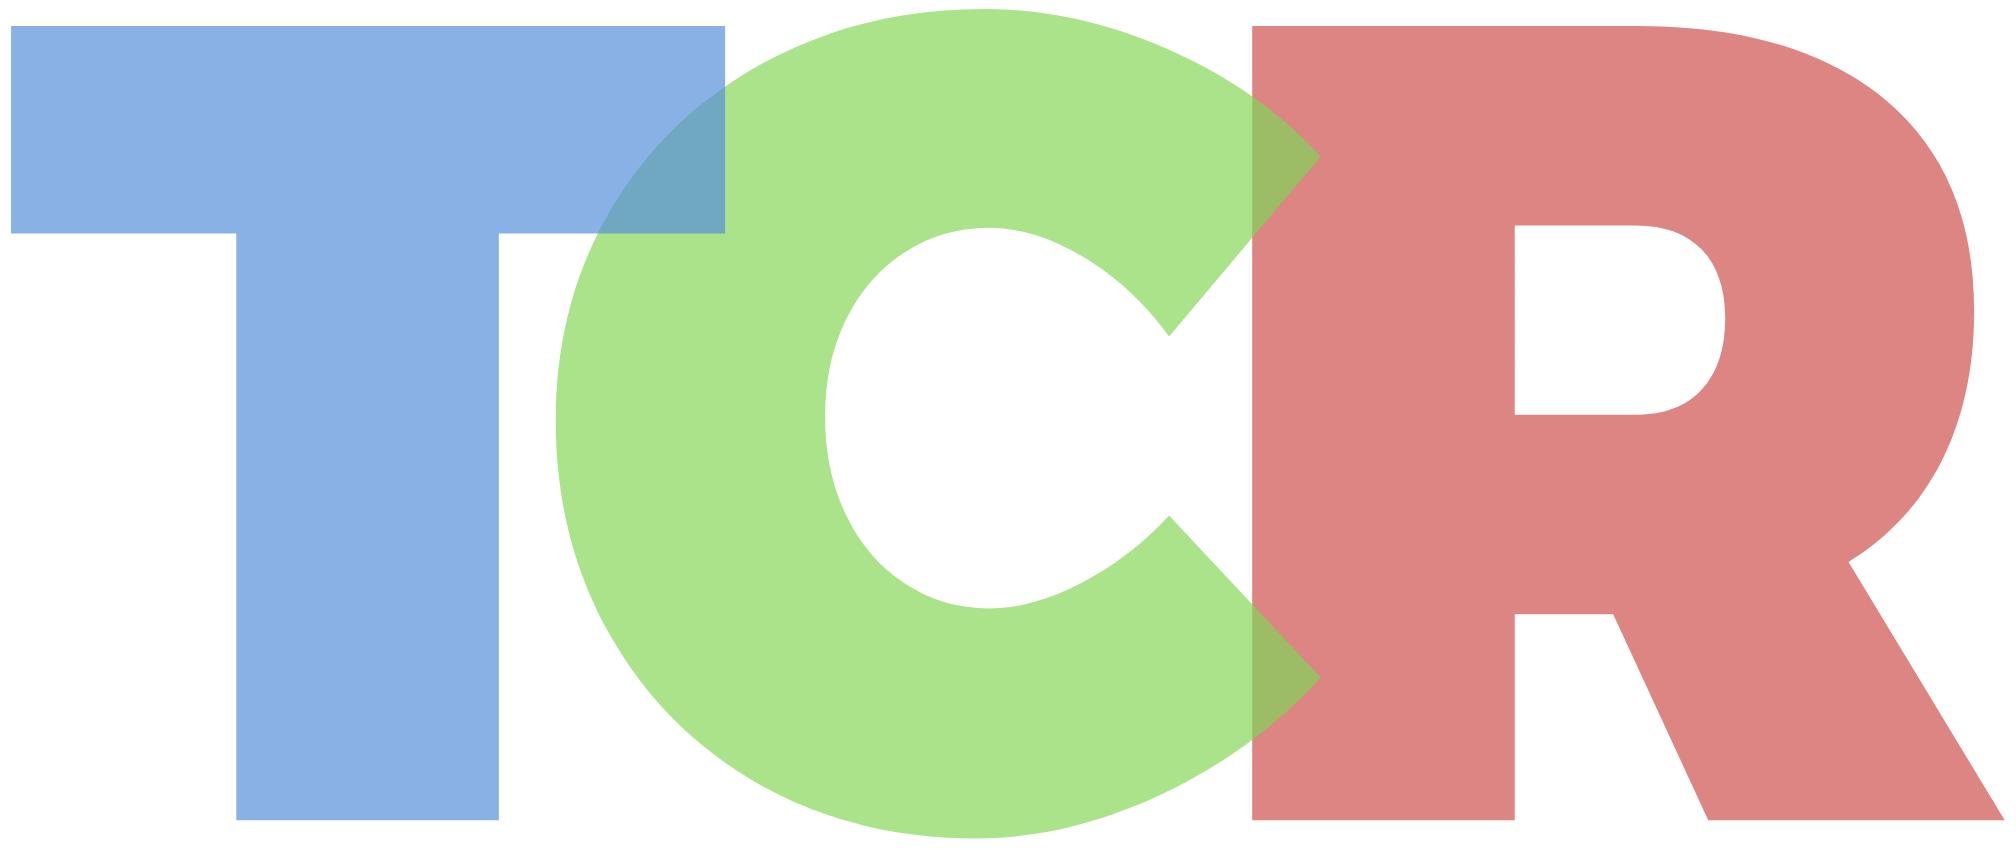 tefl course review logo